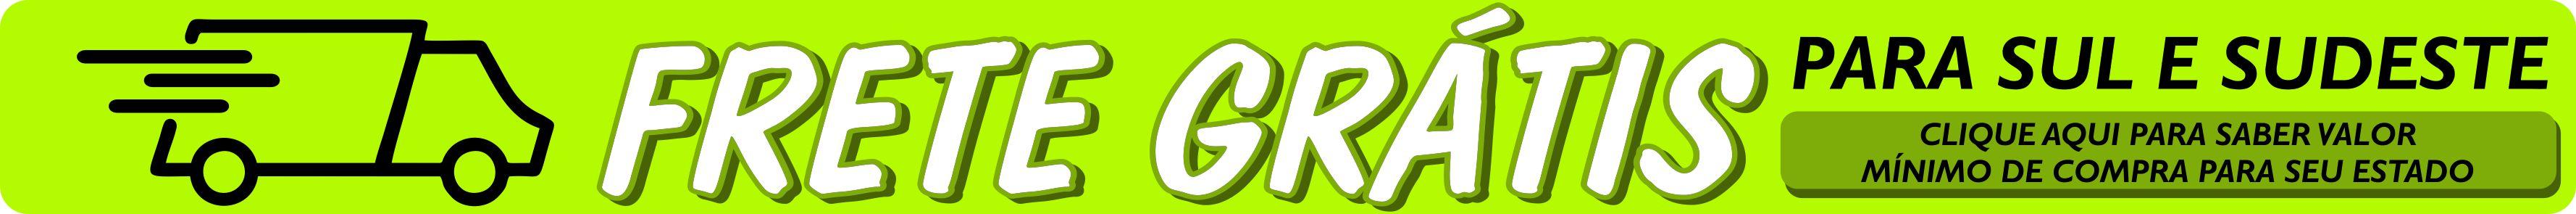 FRETE GRATIS 20